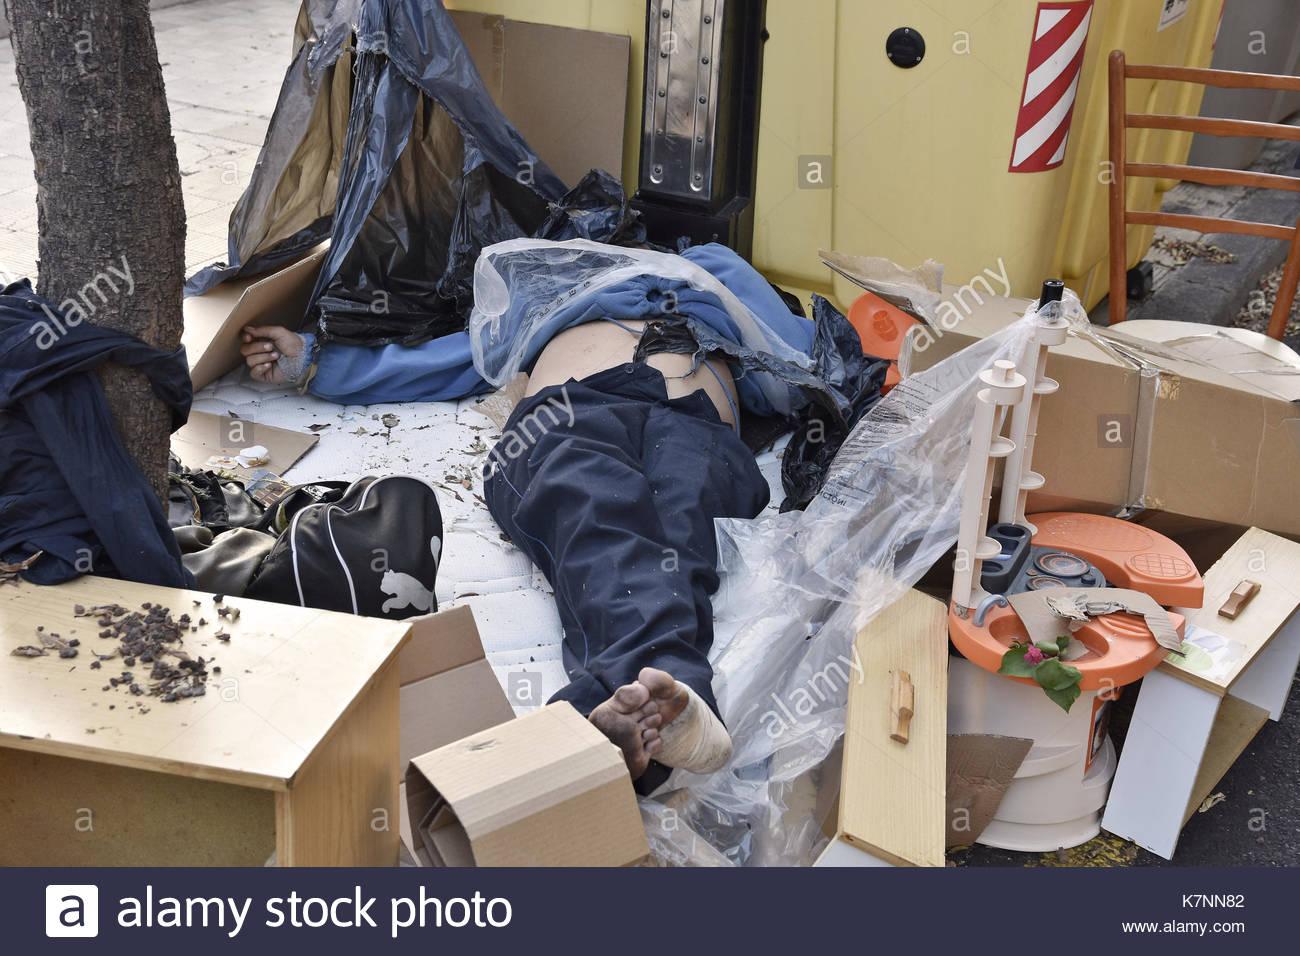 Man sleeping on the mattress beside rubbish bin in Santa Cruz de Tenerife Canary Islands Spain. - Stock Image